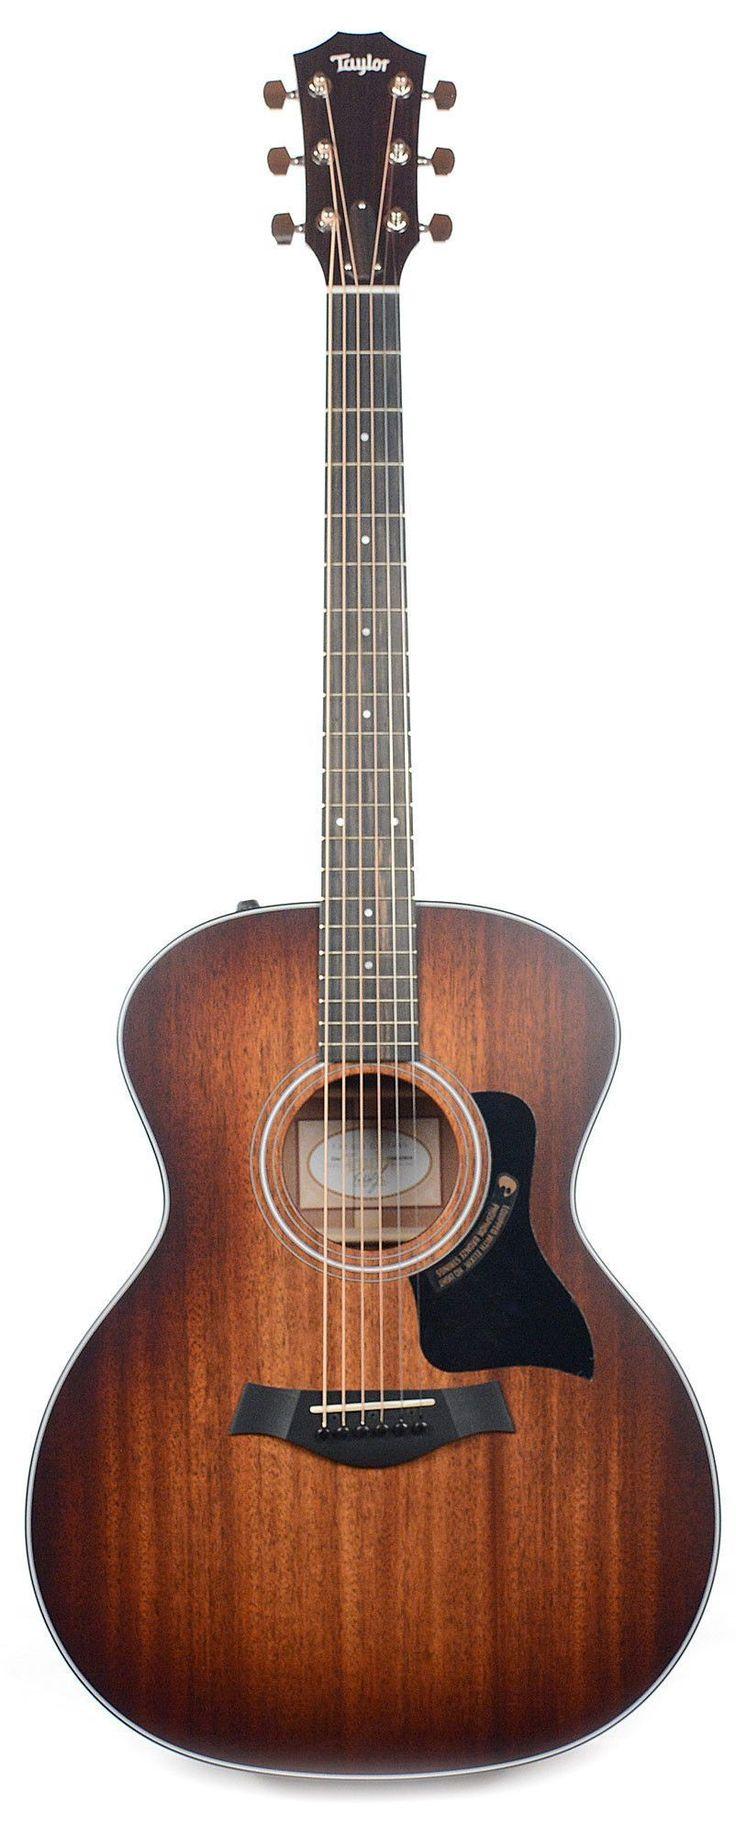 210 Best Guitars Images On Pinterest Acoustic Guitar Gretsch Synchromatic Wiring Diagram Taylor 324ce Seb Edgeburst Grand Auditorium Electric